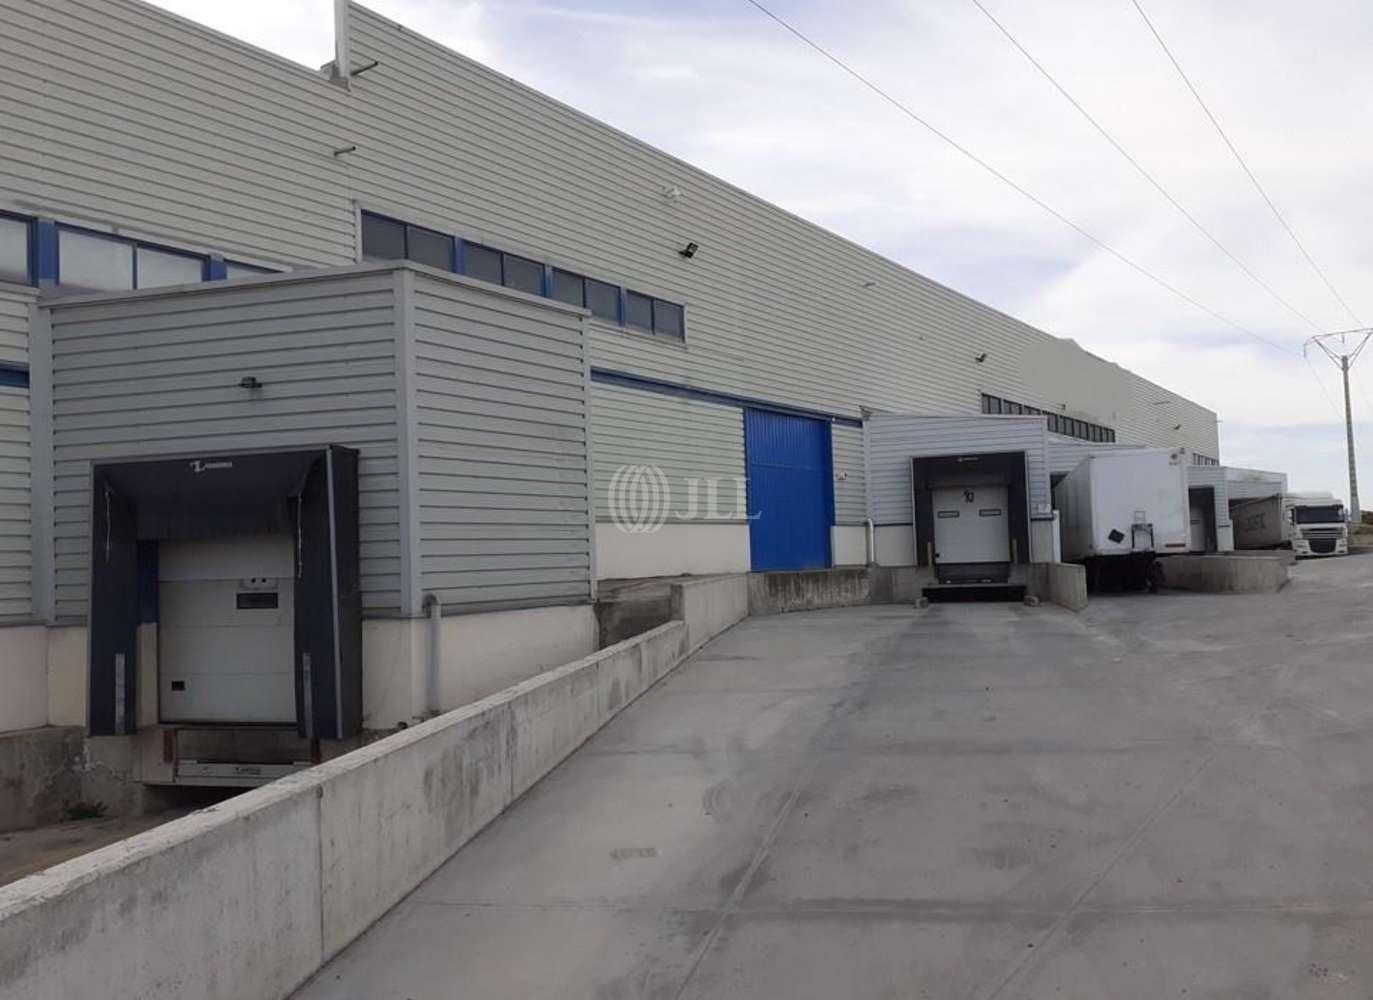 Naves industriales y logísticas Seseña, 45224 - Nave Industrial - M0415 NAVE INDUSTRIAL SESEÑA